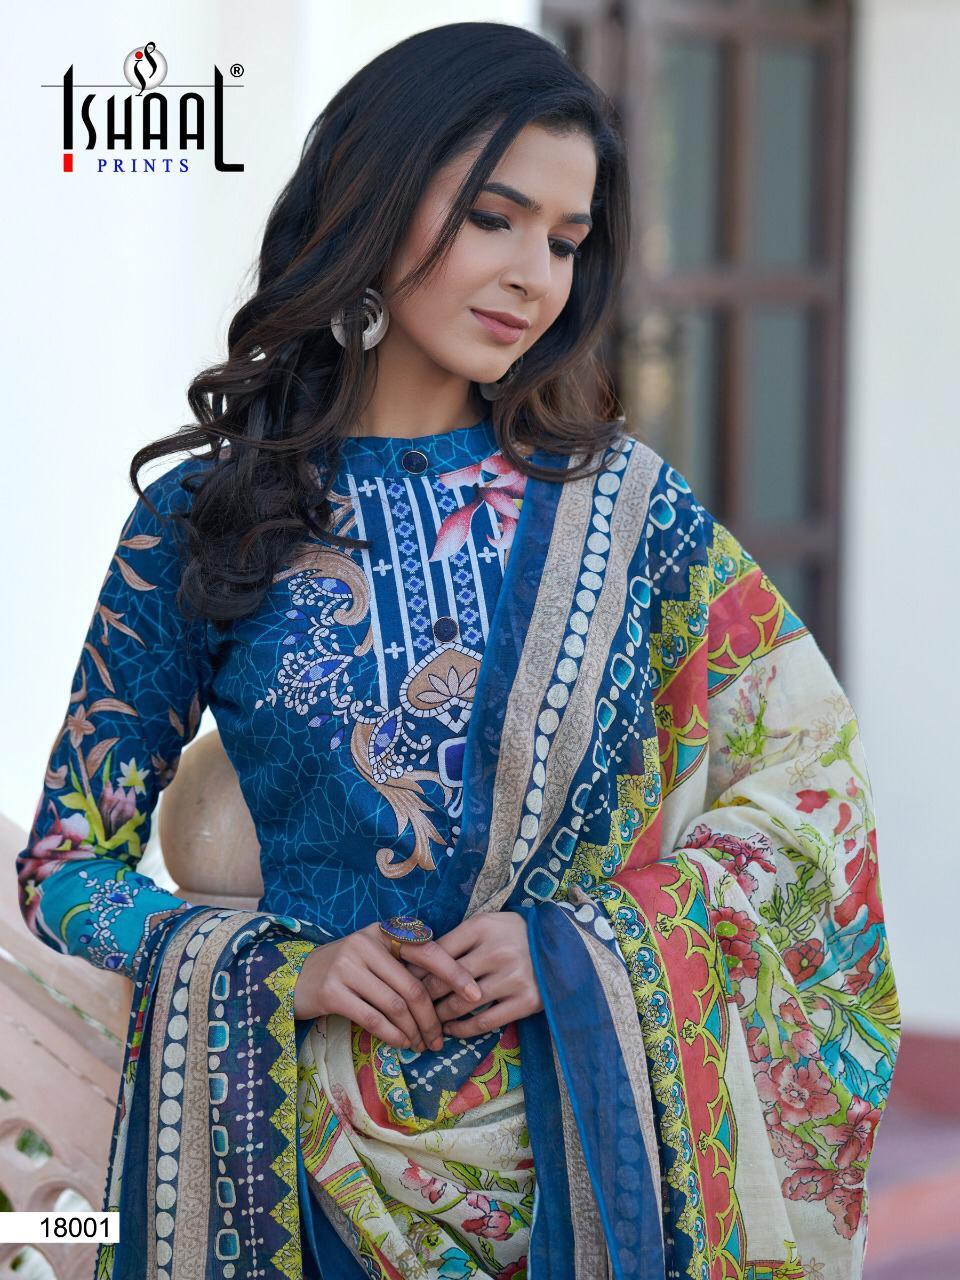 Ishaal Gulmohar Vol 18 Salwar Suit Wholesale Catalog 10 Pcs 20 - Ishaal Gulmohar Vol 18 Salwar Suit Wholesale Catalog 10 Pcs